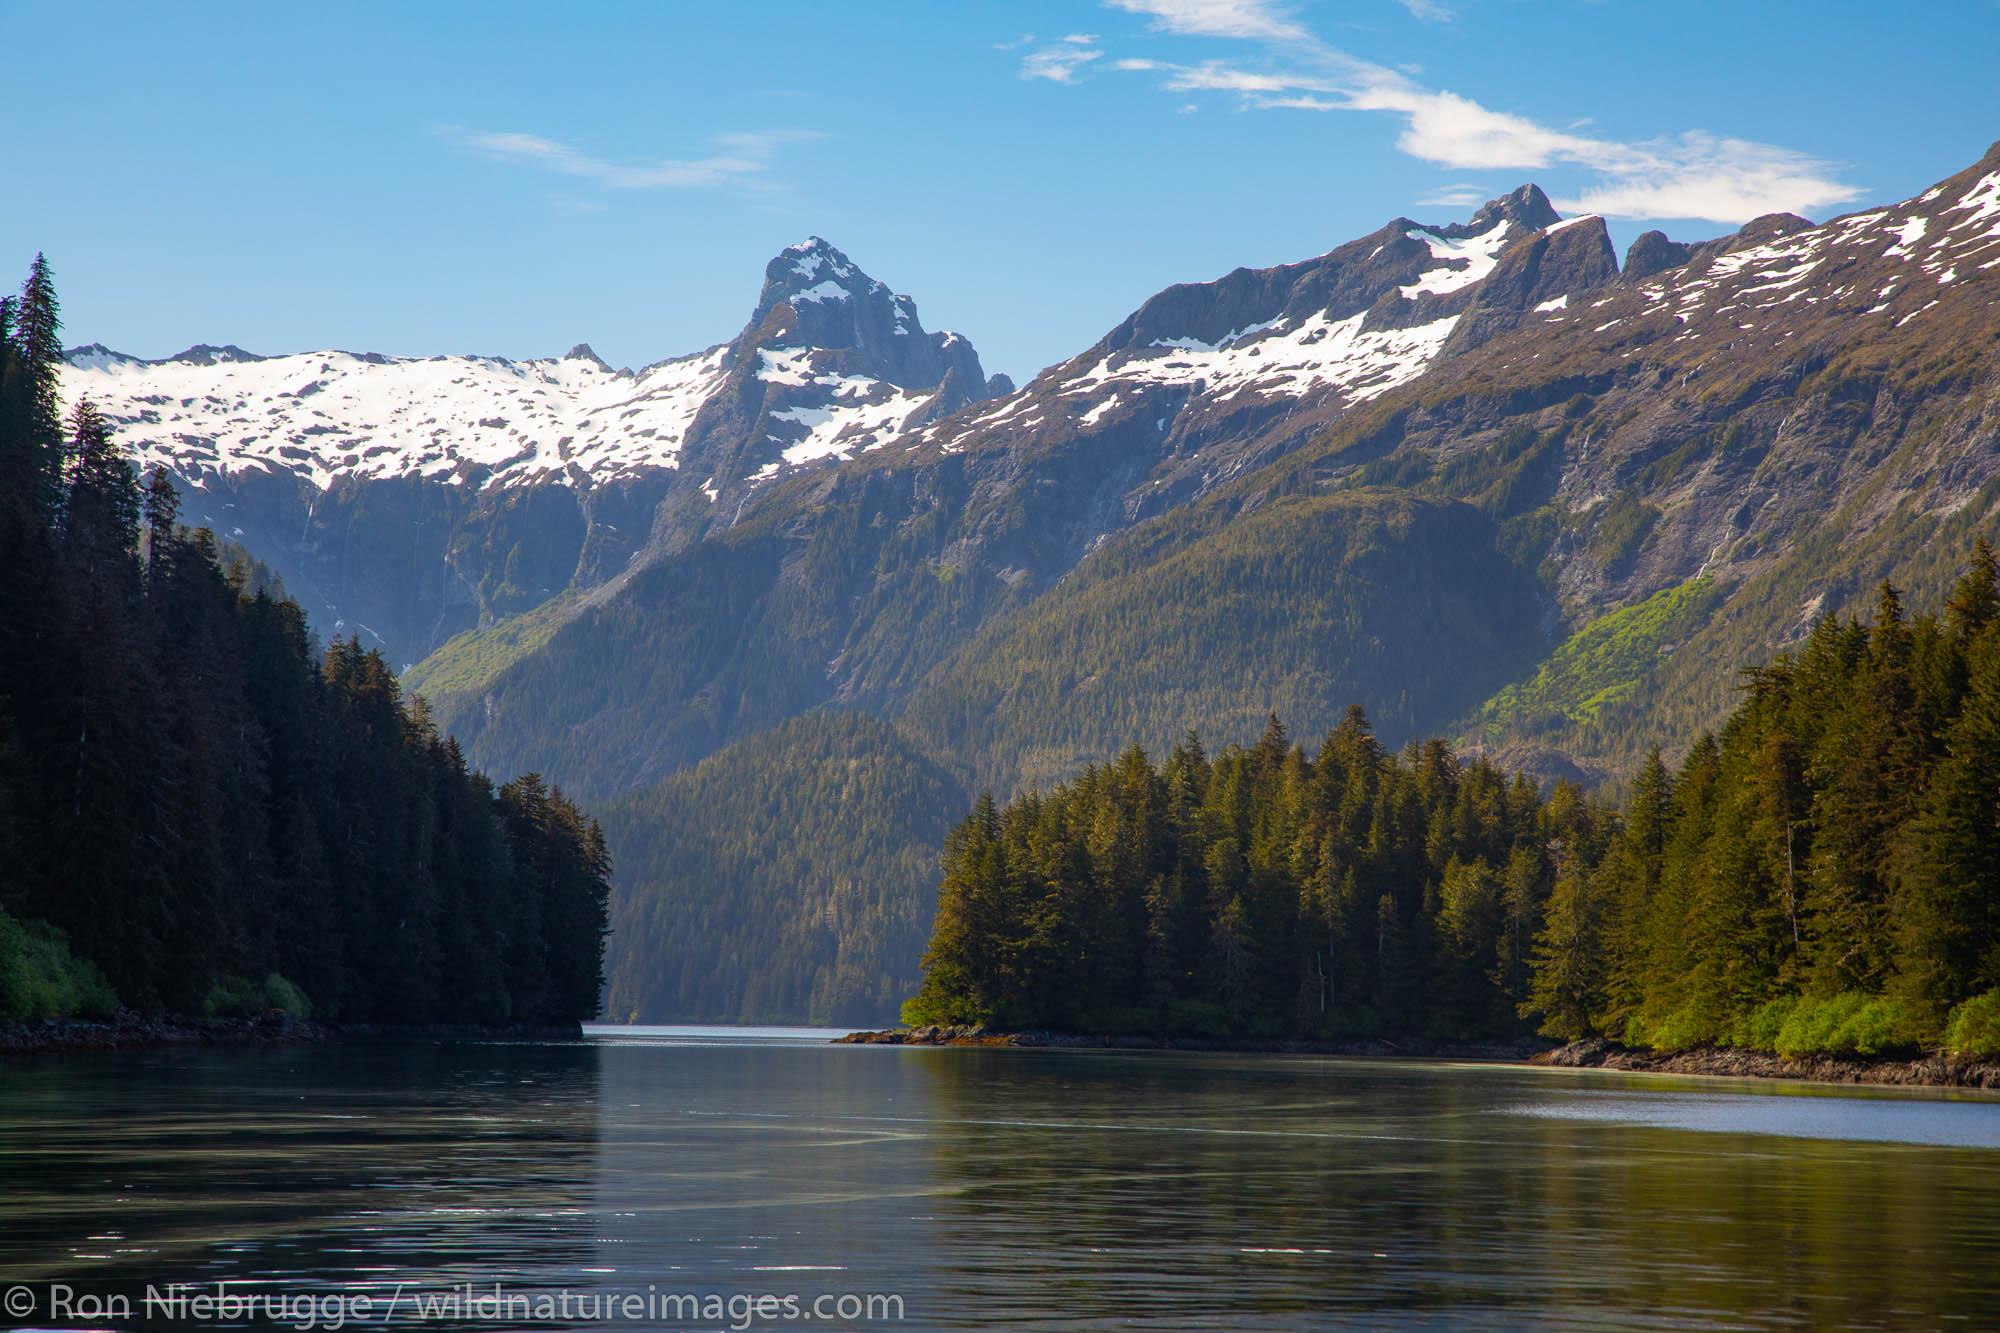 Red Bluff, Baranof Island, Tongass National Forest, Alaska.